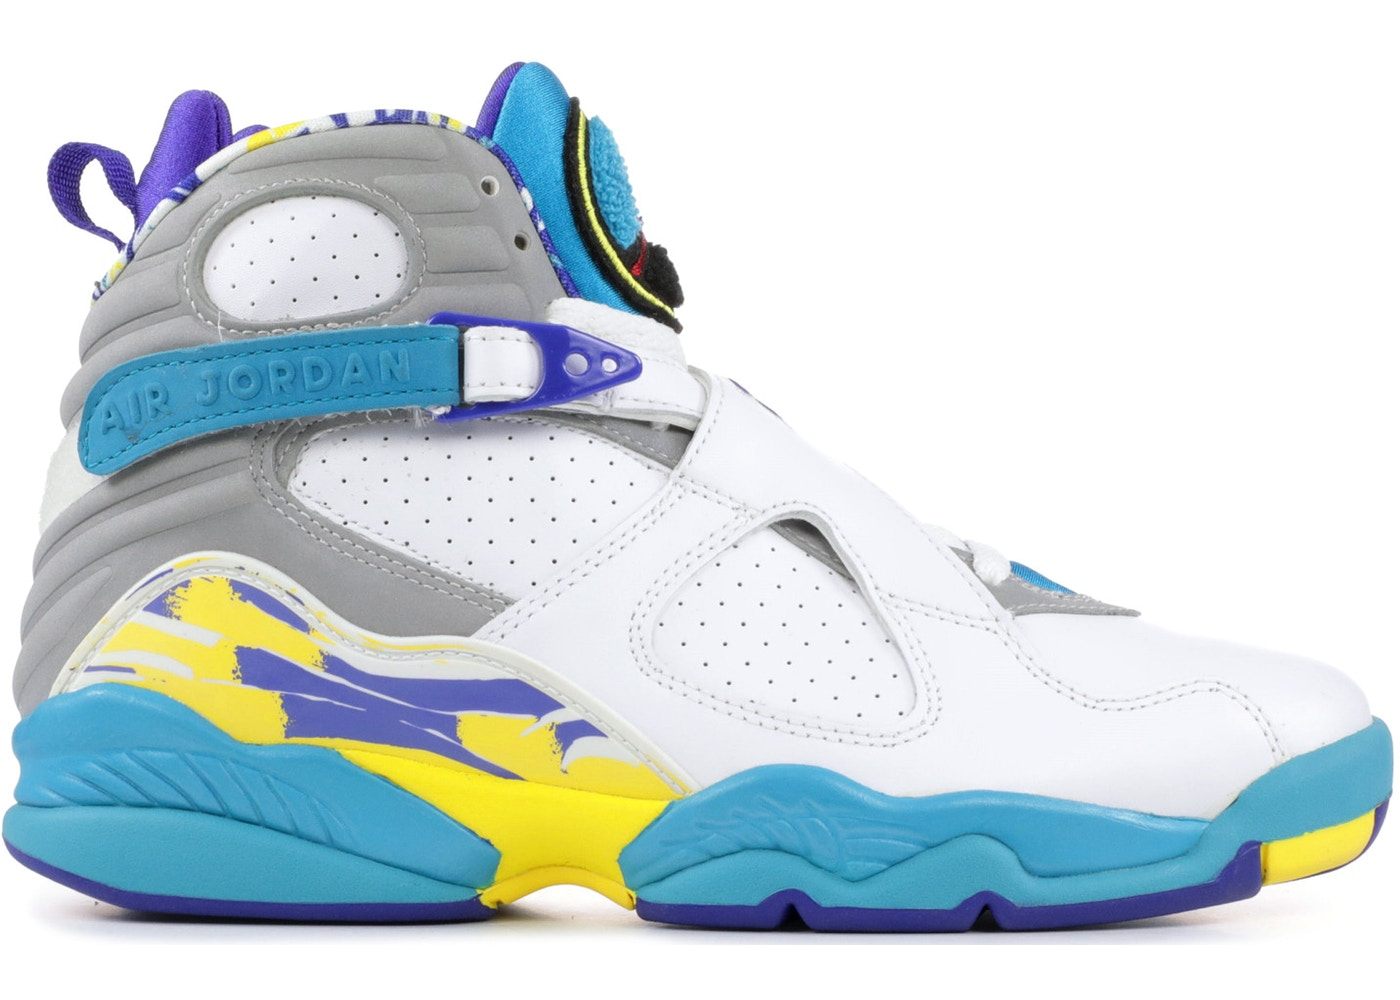 los angeles d0161 4396b Air Jordan 8 Shoes - Average Sale Price